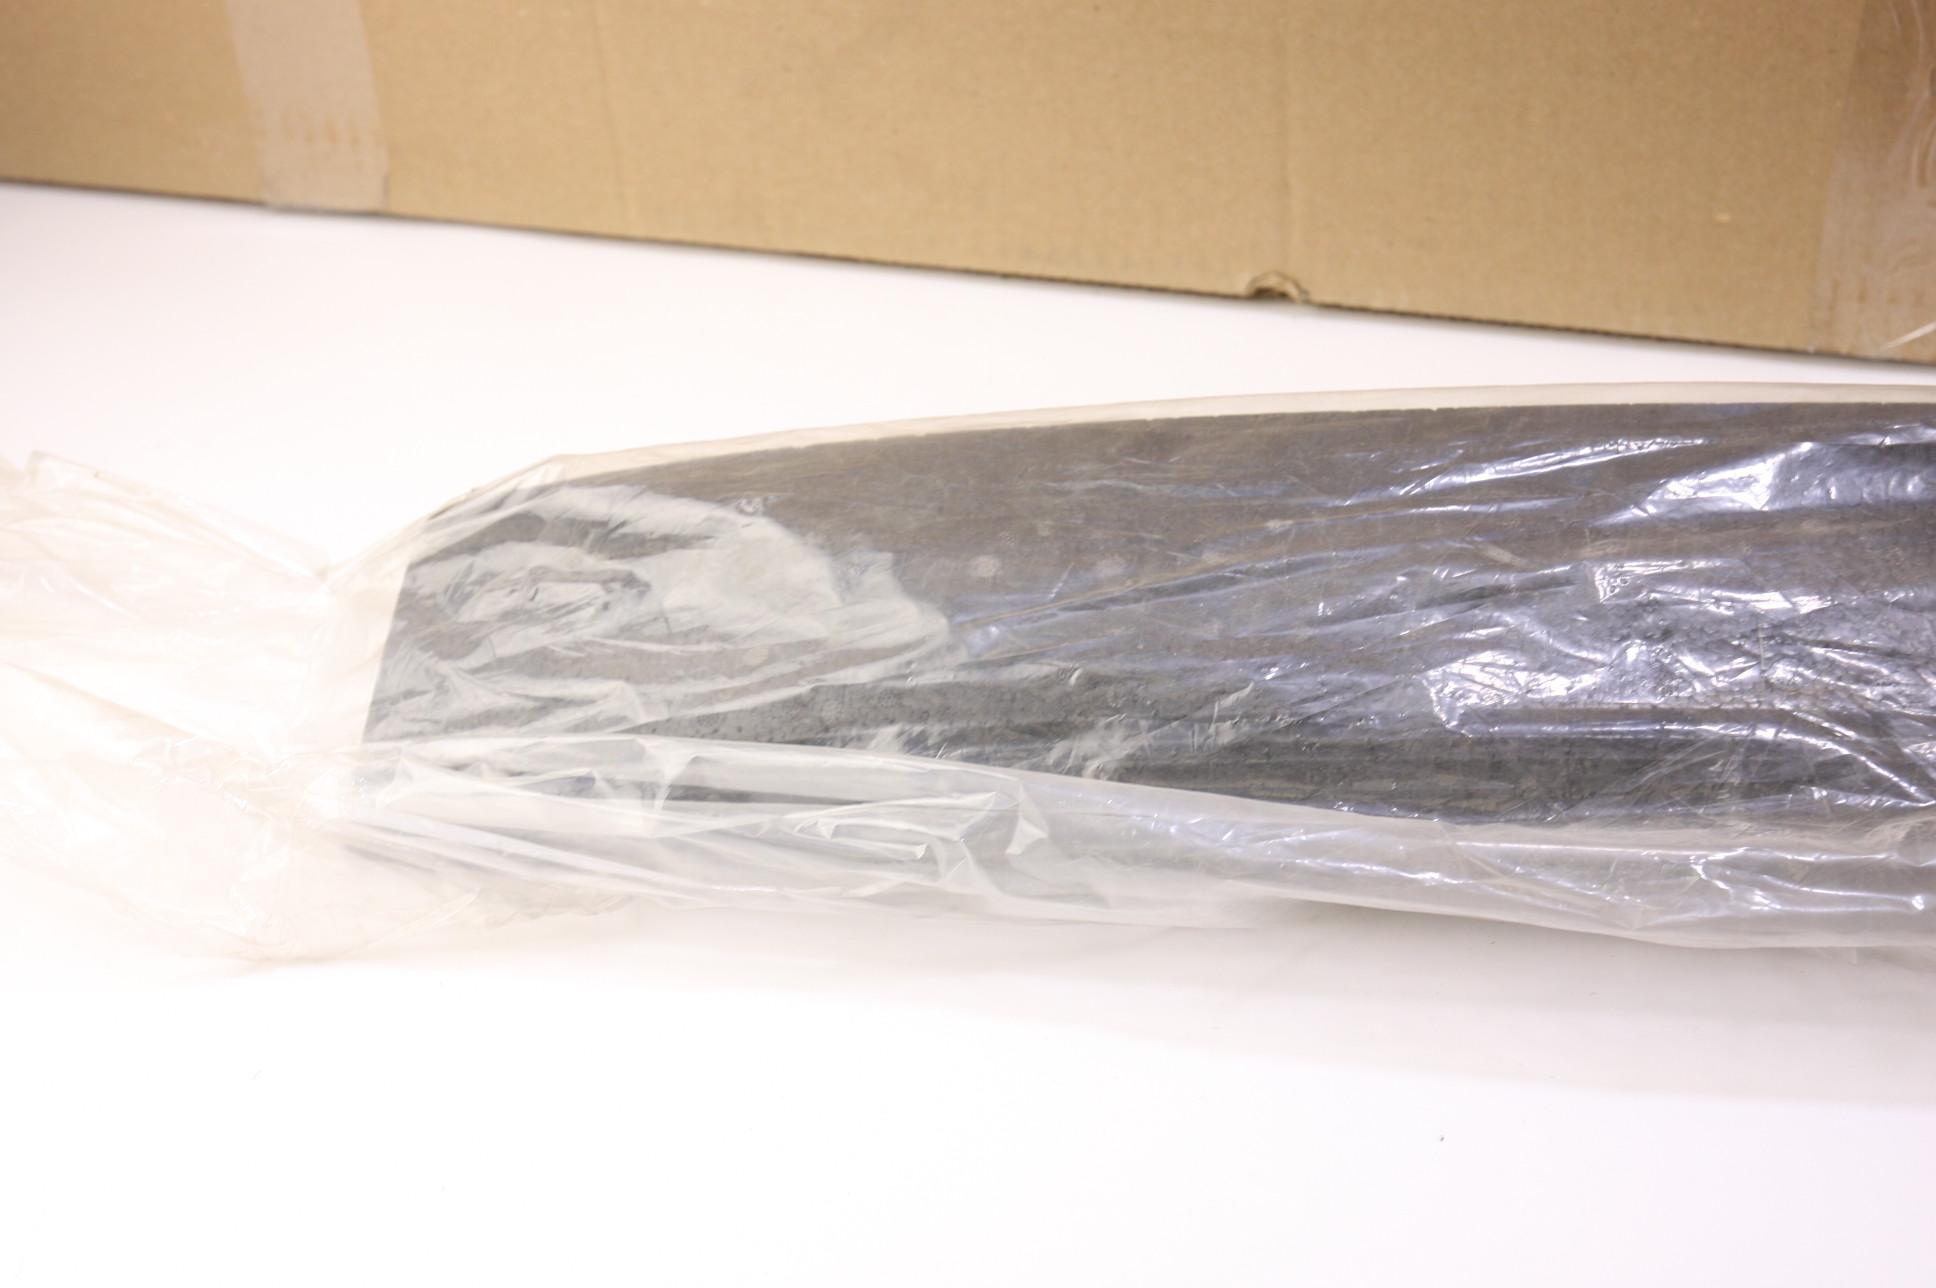 *~New OEM 85090JA00A Nissan 07-12 Altima Bumper Face Foam Impact Absorber Bar - image 3